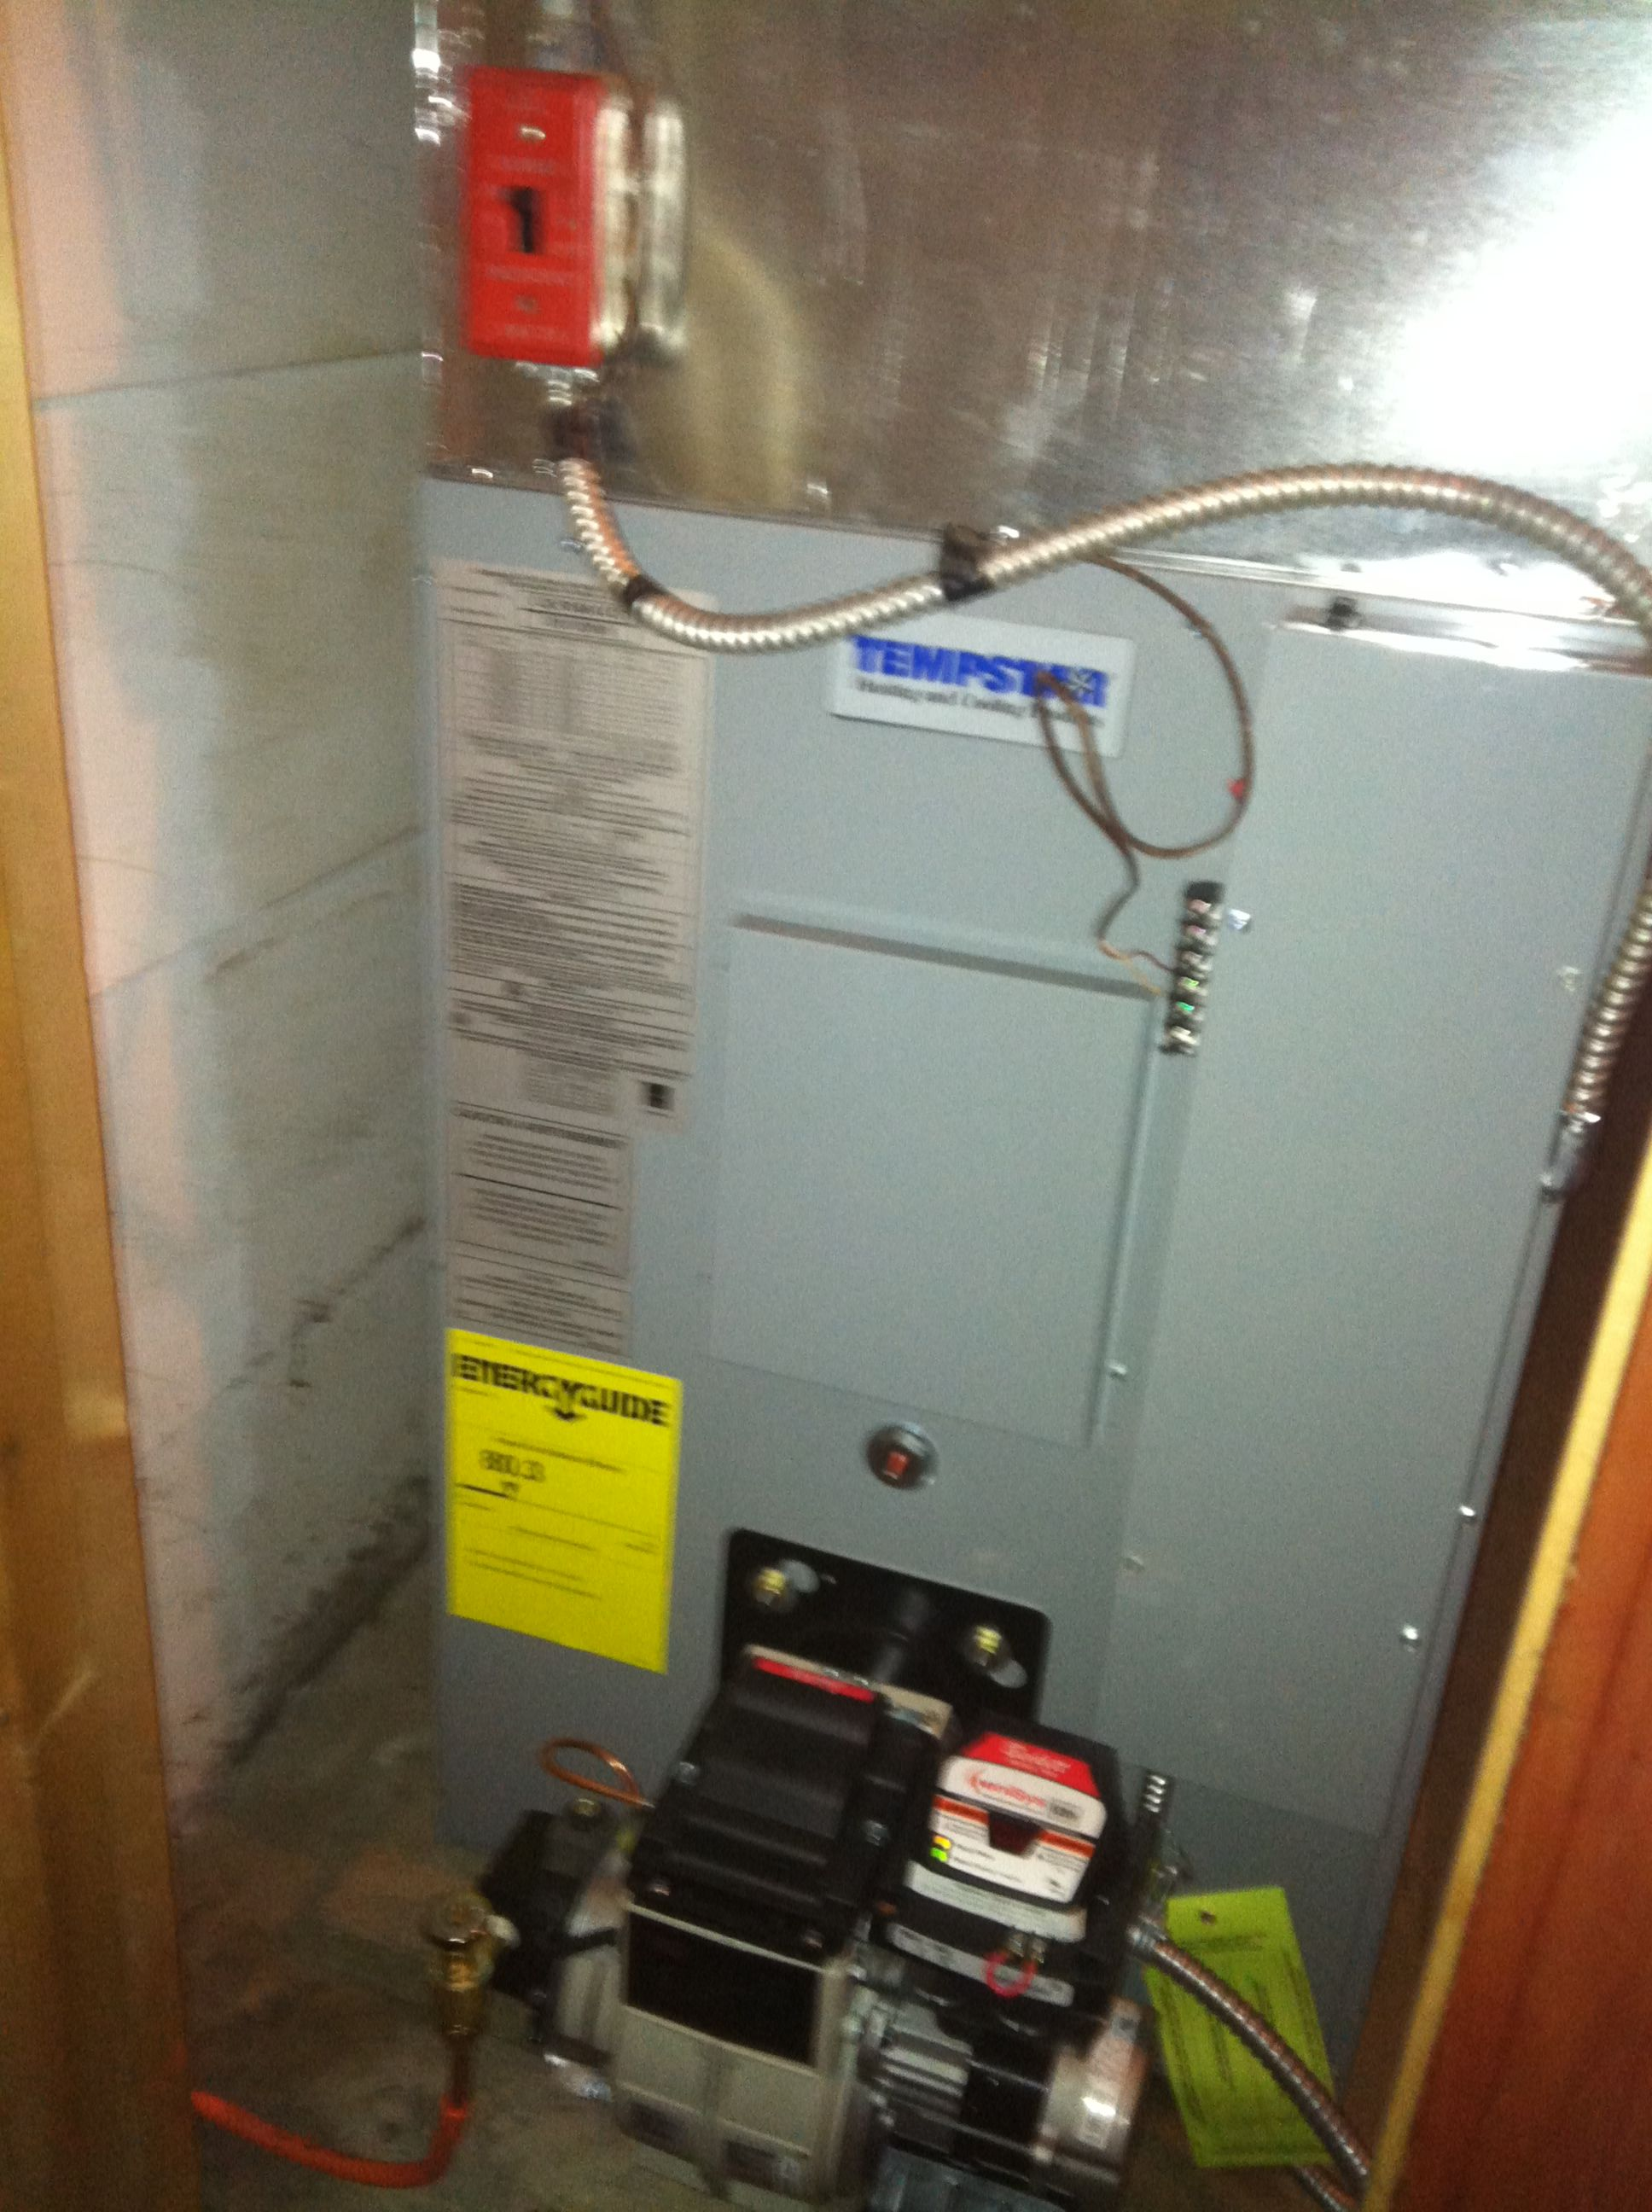 Tempstar forced hot air furnace w/ Beckett AFG oil burner